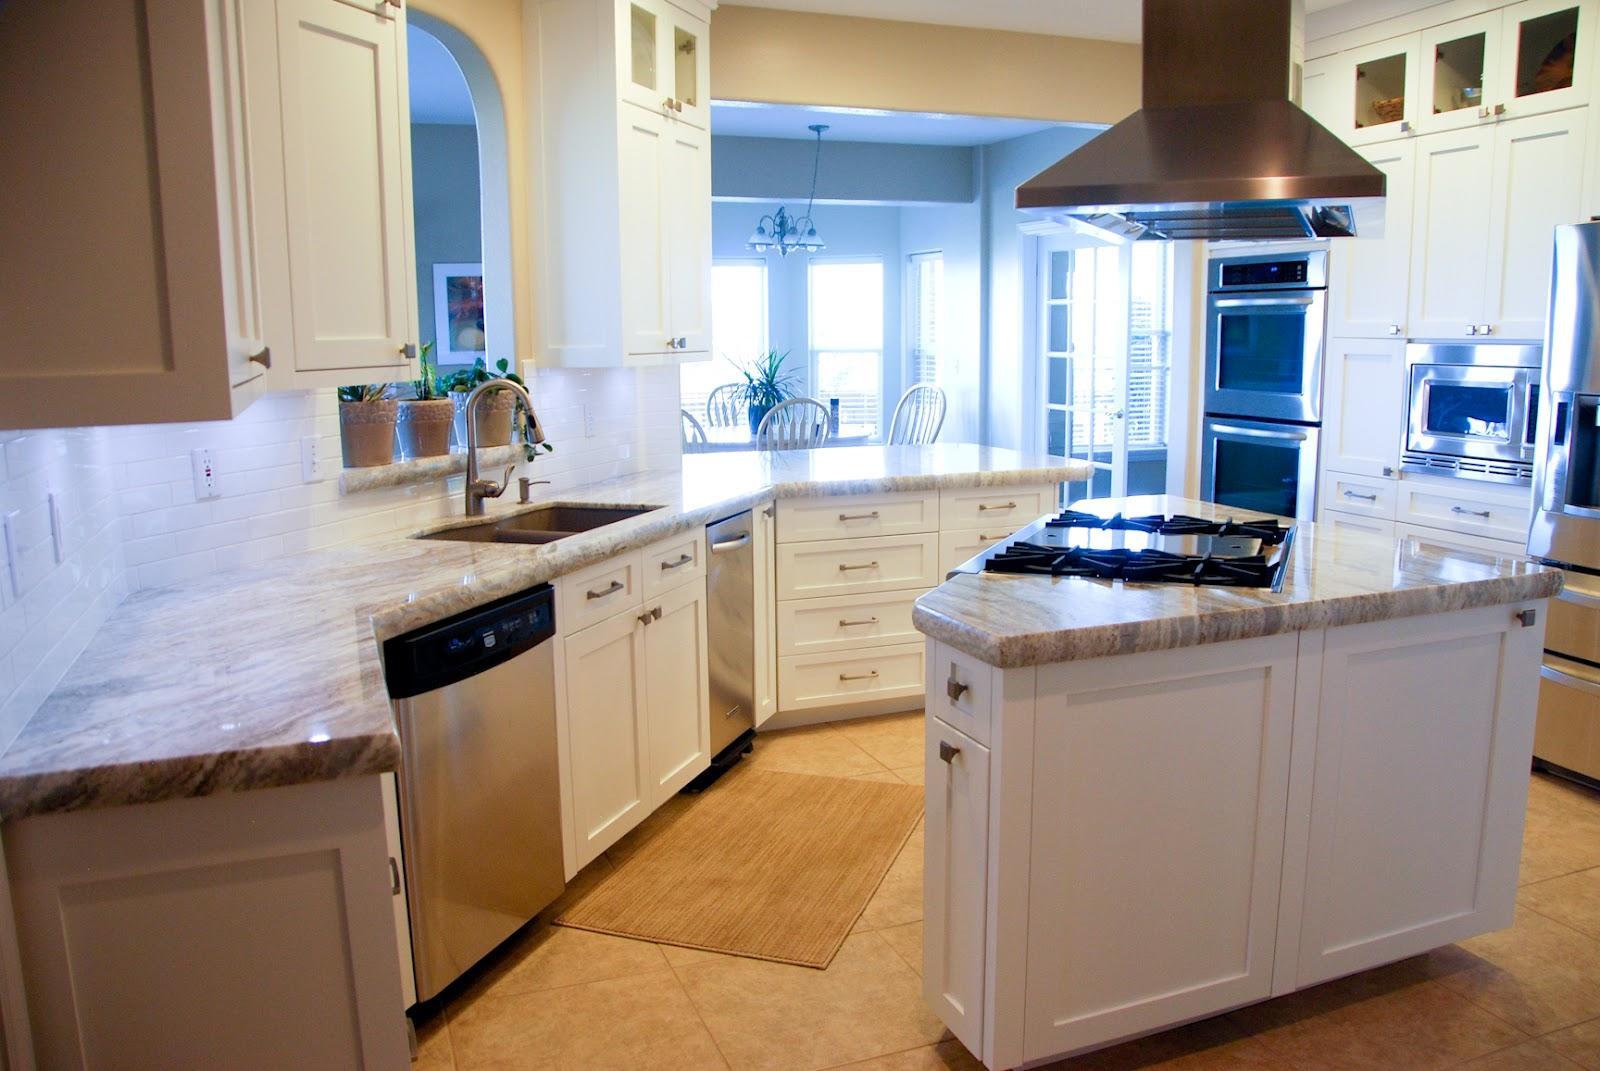 The Granite Gurus Fantasy Brown Granite Kitchen From Mgs